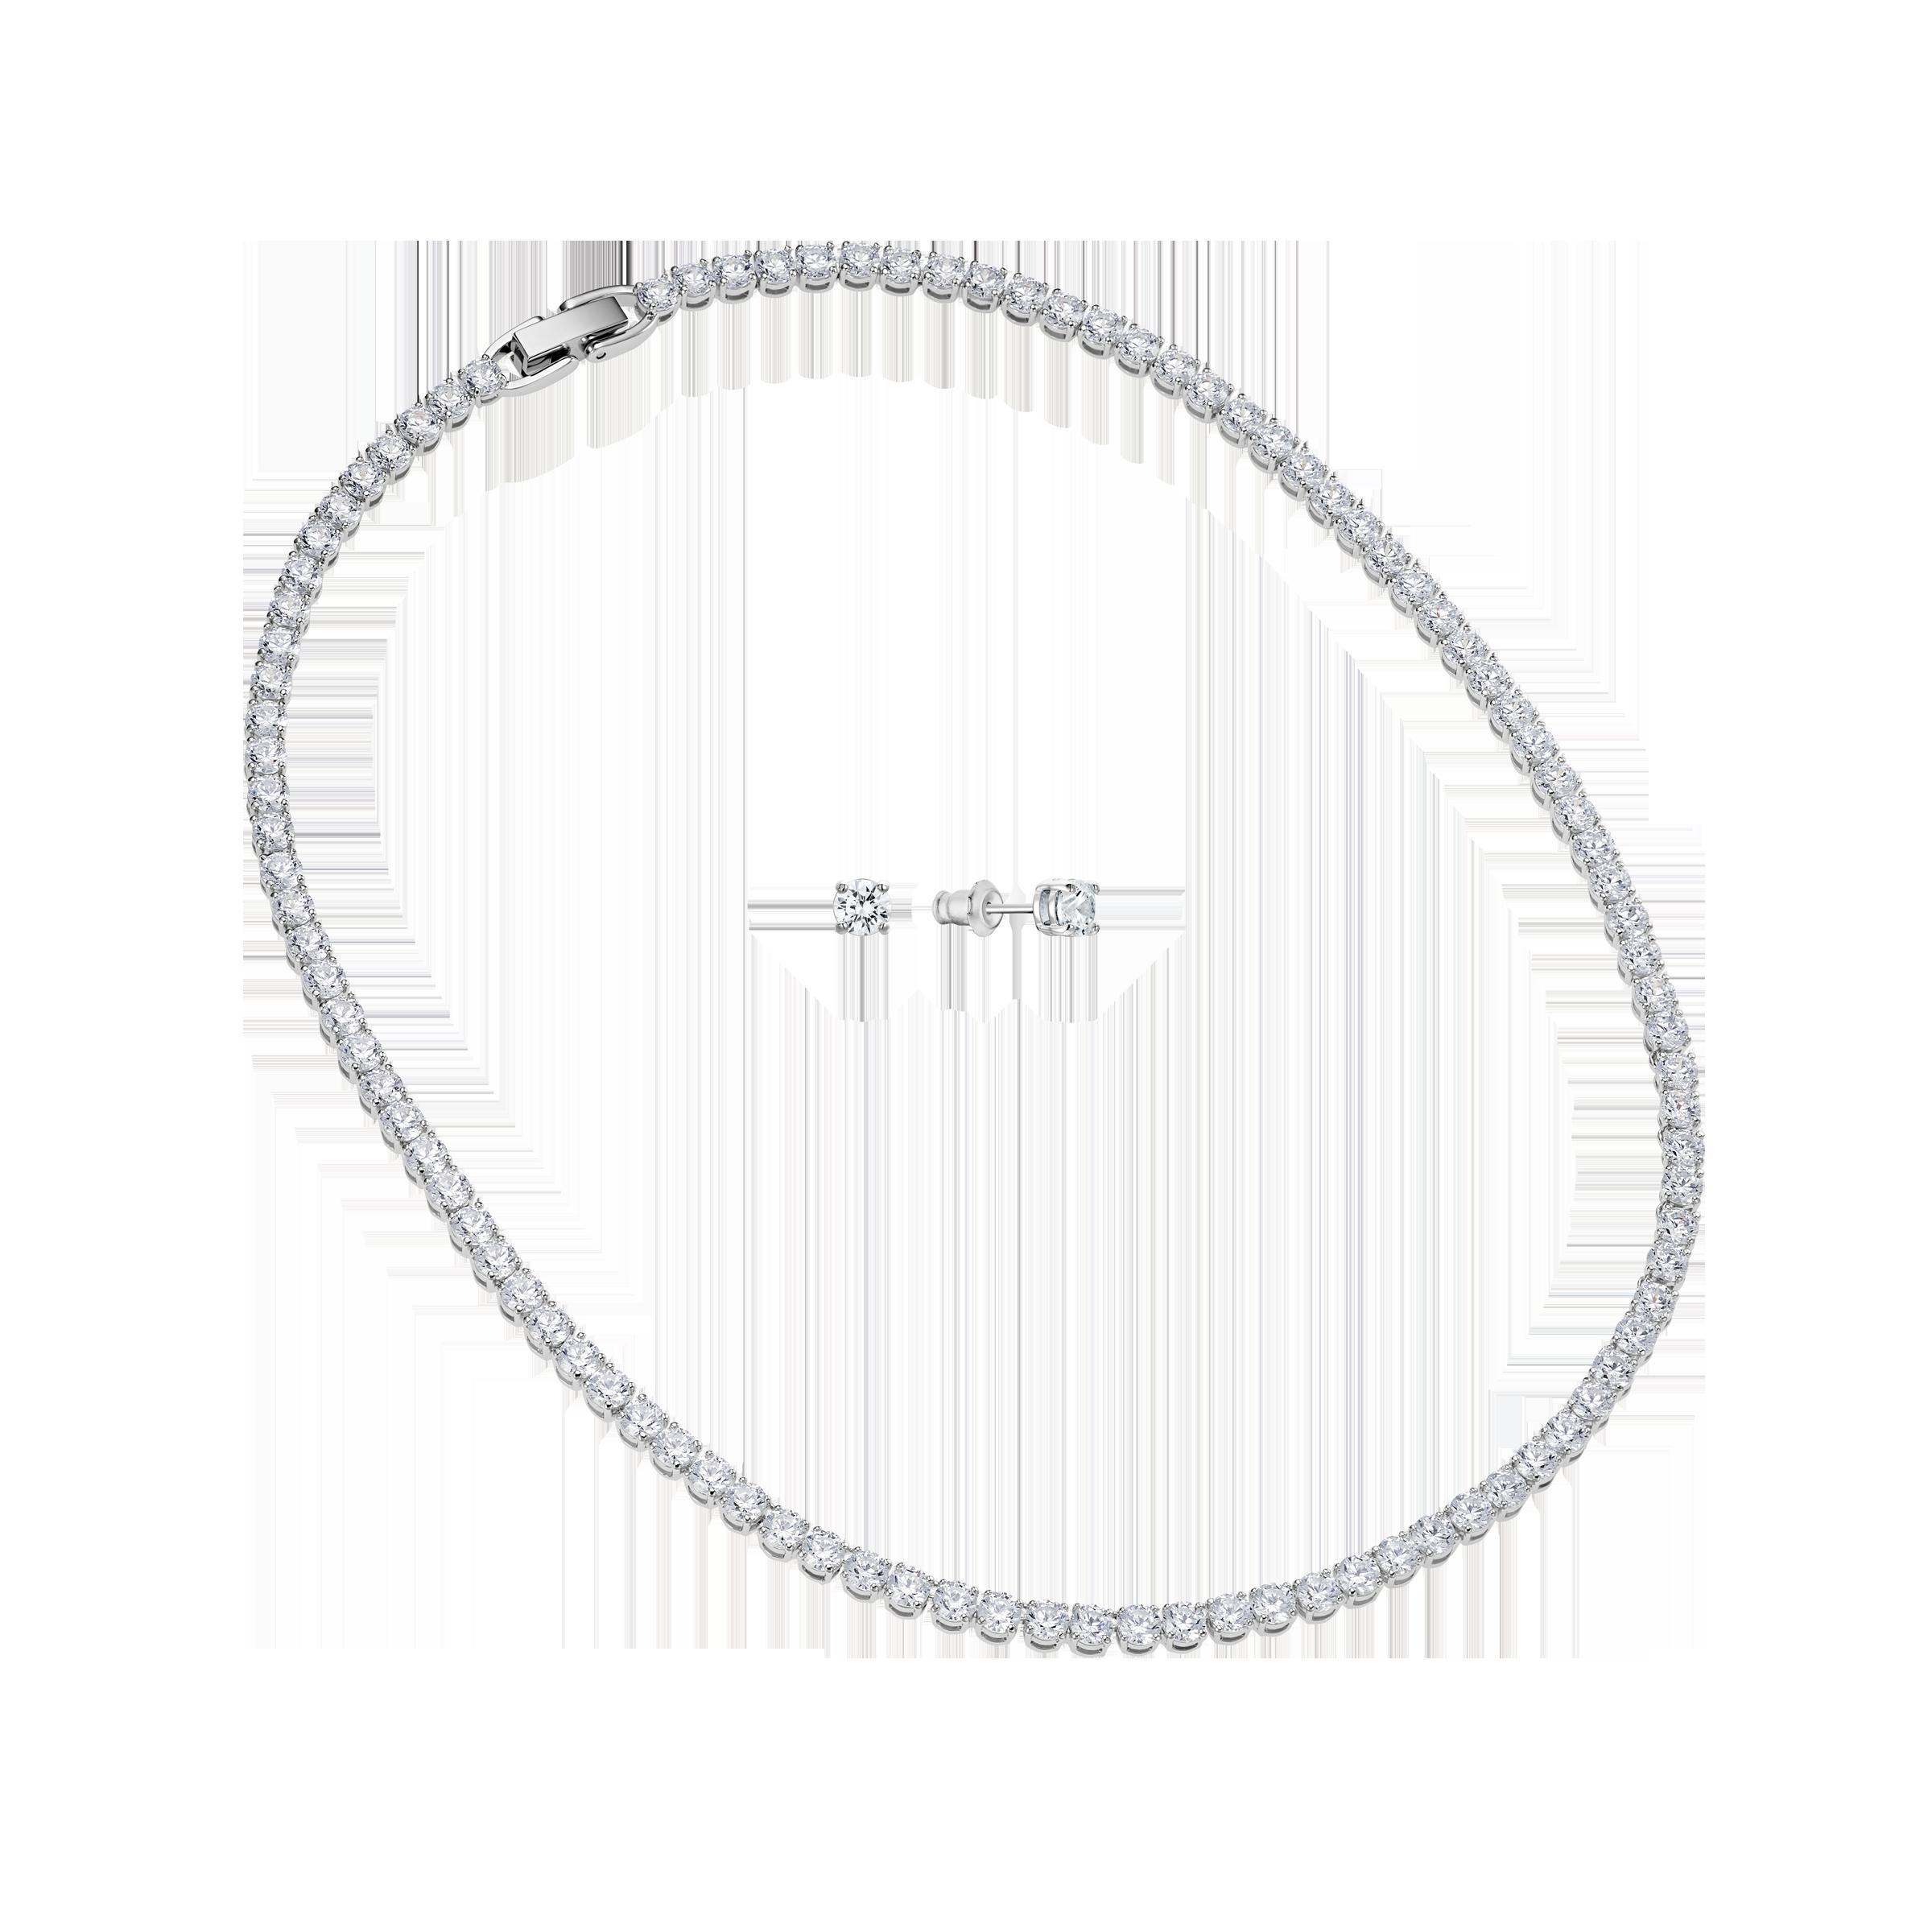 Tennis Deluxe Set, White, Rhodium plated